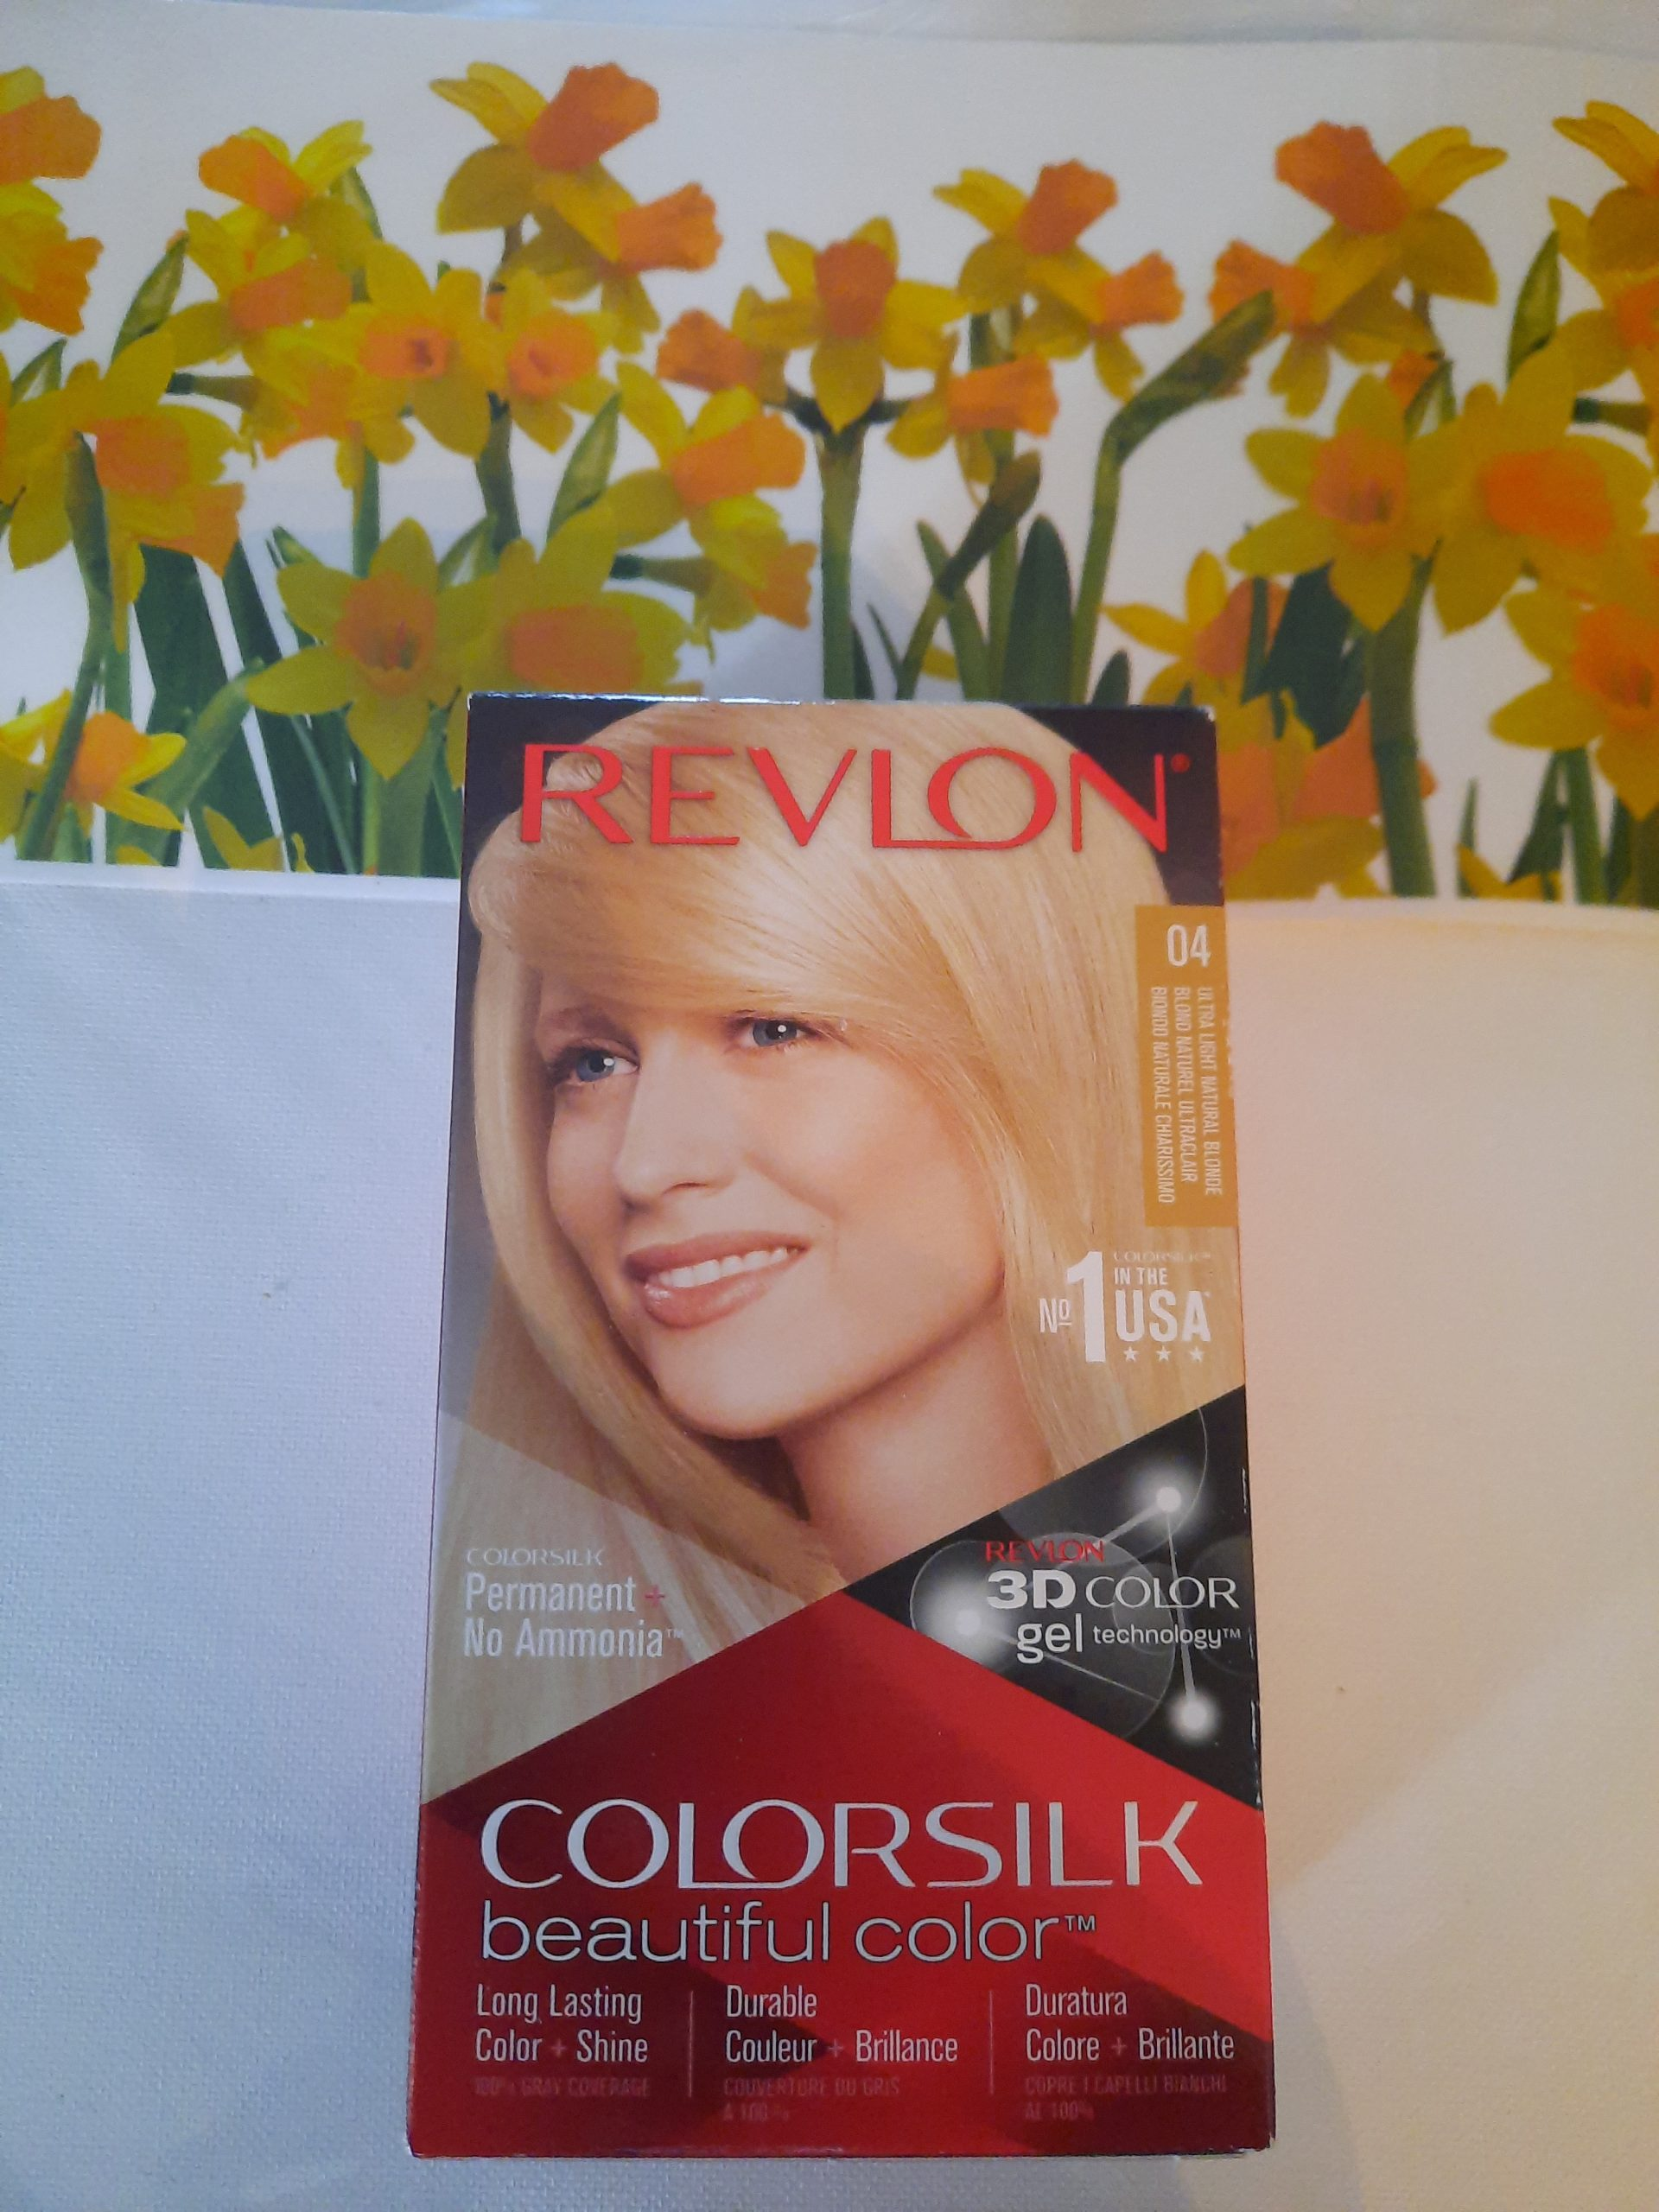 Revelon colorsilk